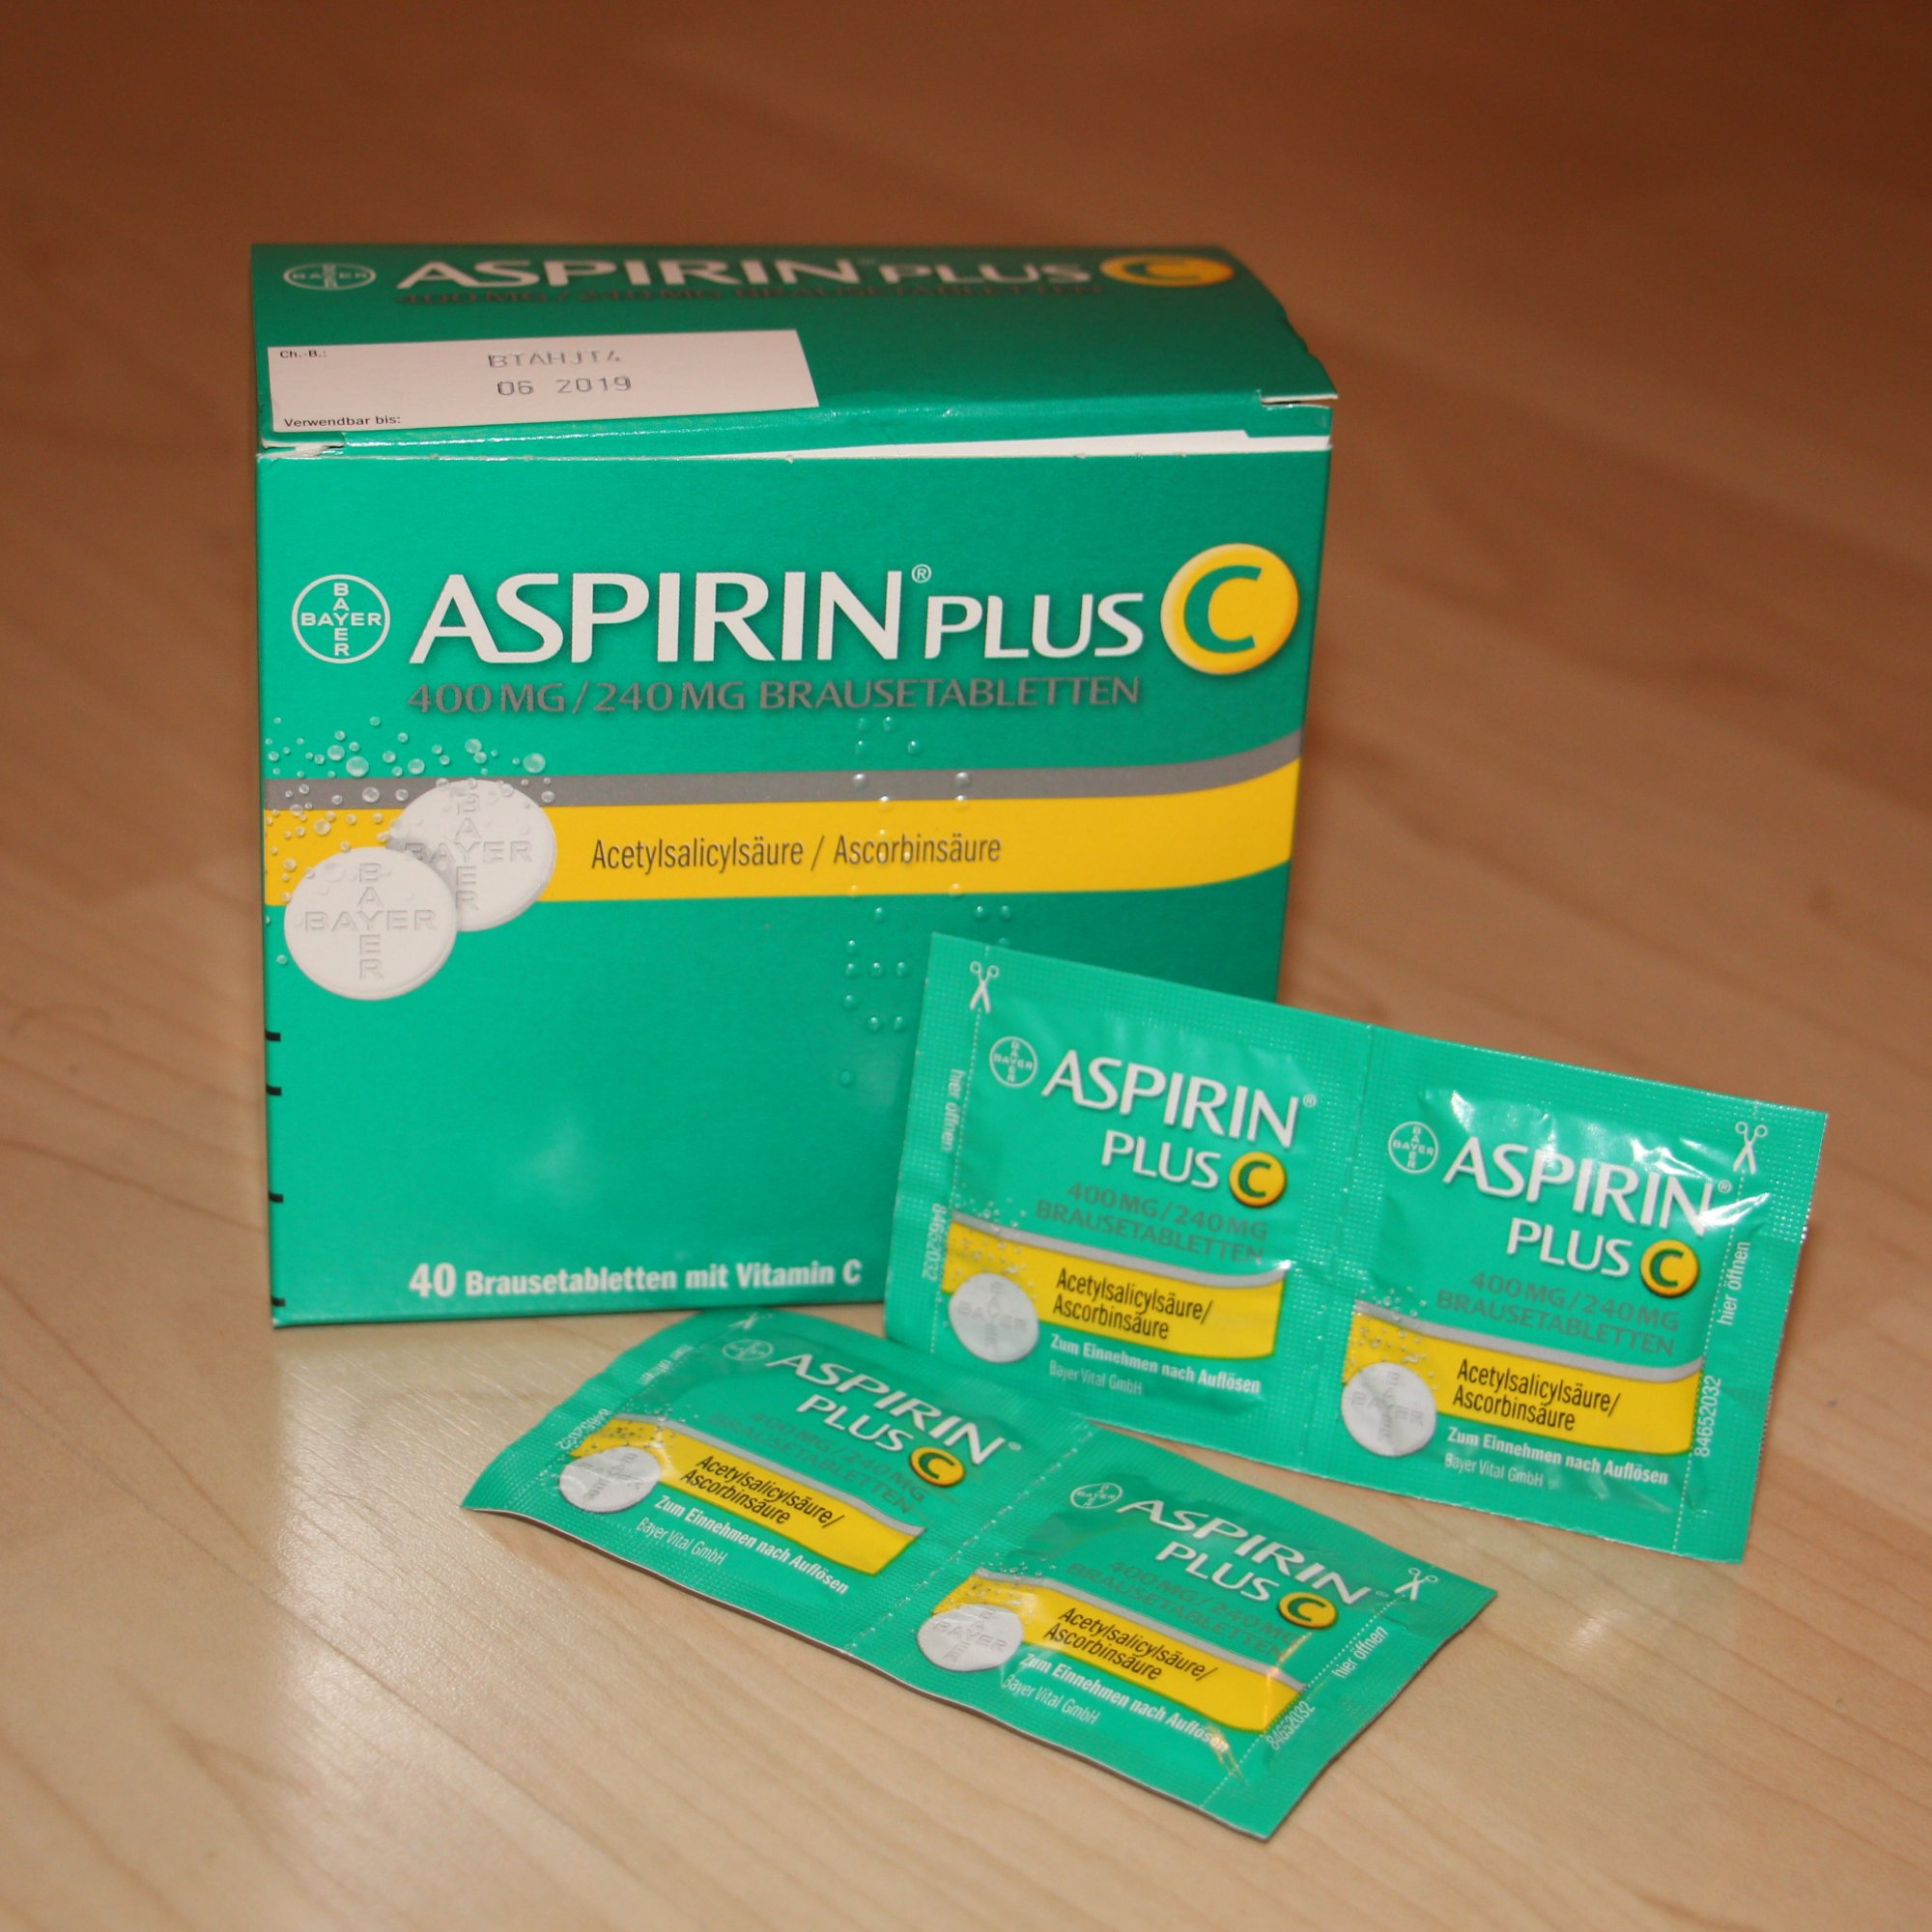 leil.de/di/pics/aspirin_plus_c_2017.jpg